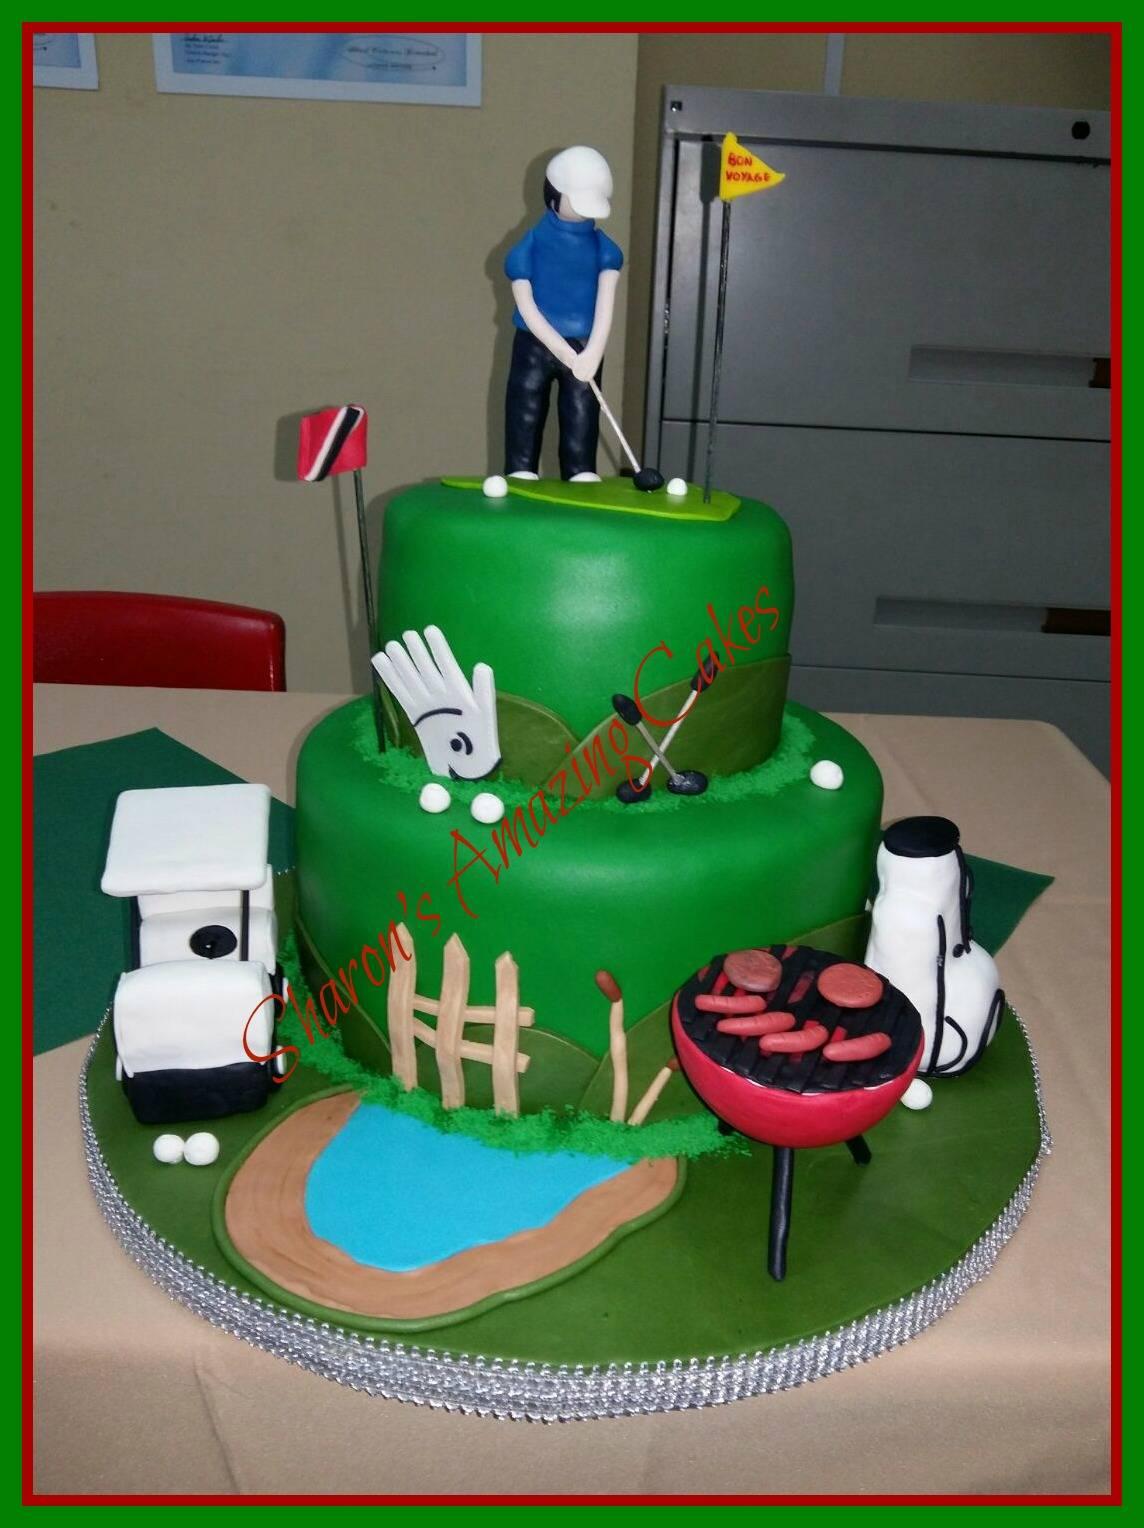 CAKE 30G - Golfer Cake